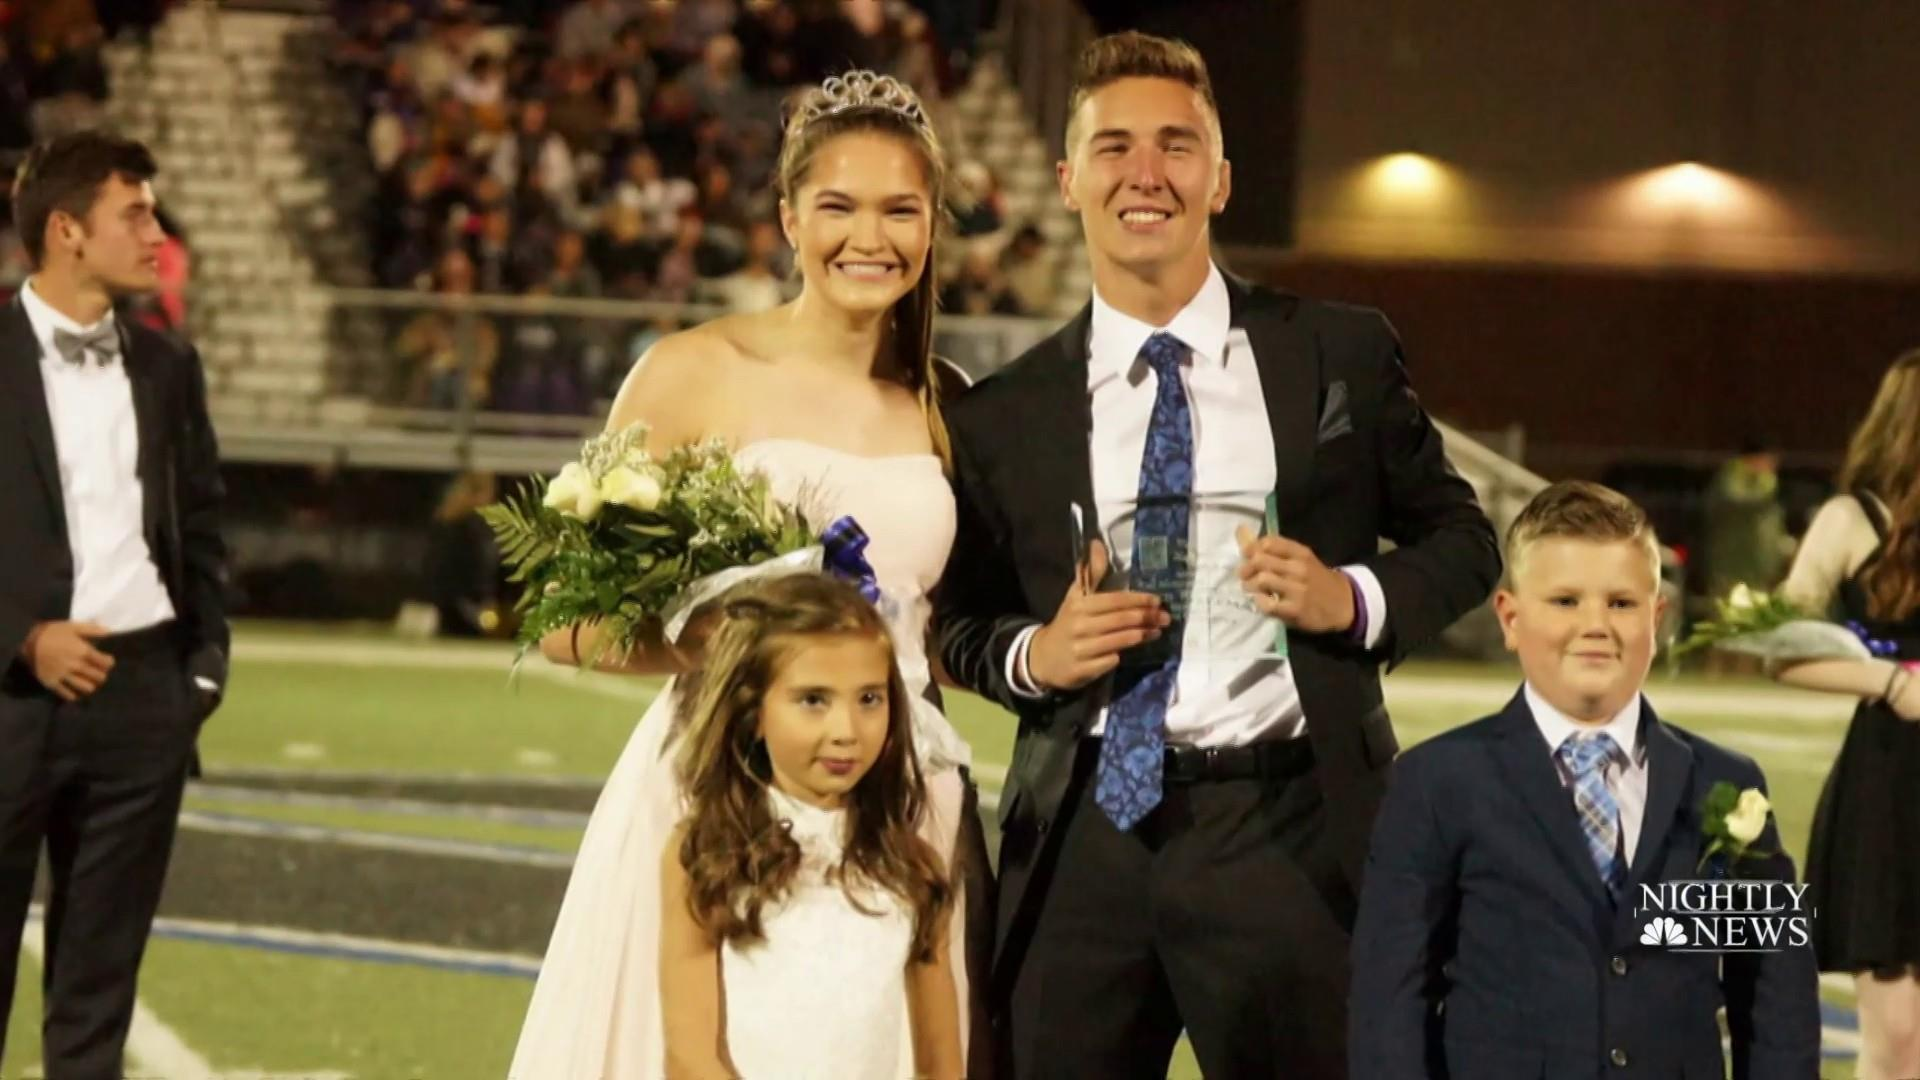 Inspiring running champion crowned homecoming king